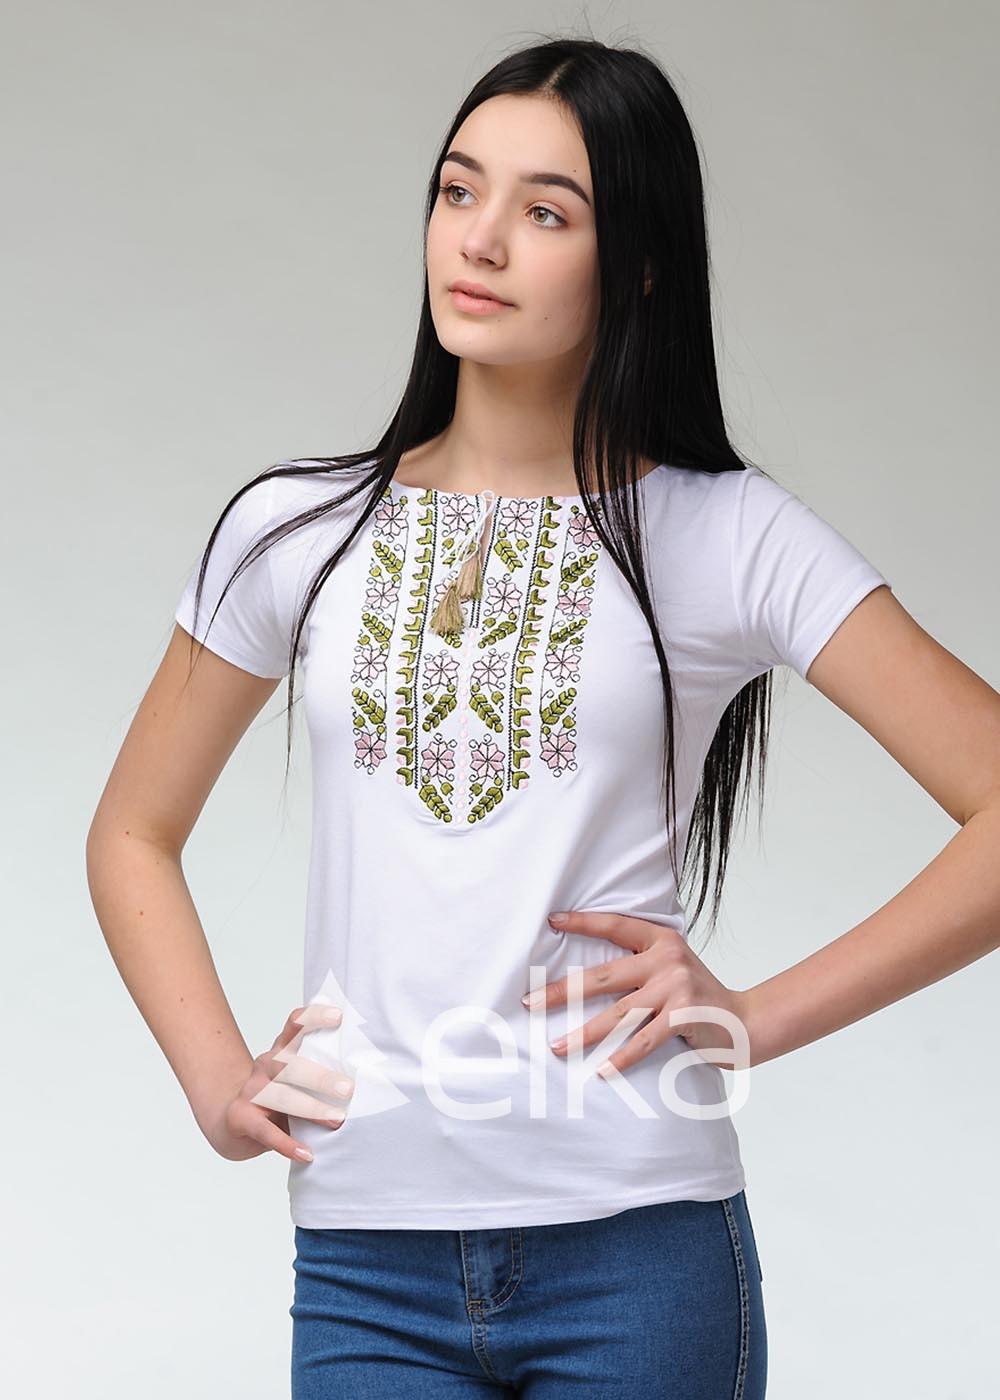 Вышитая футболка Карпатская